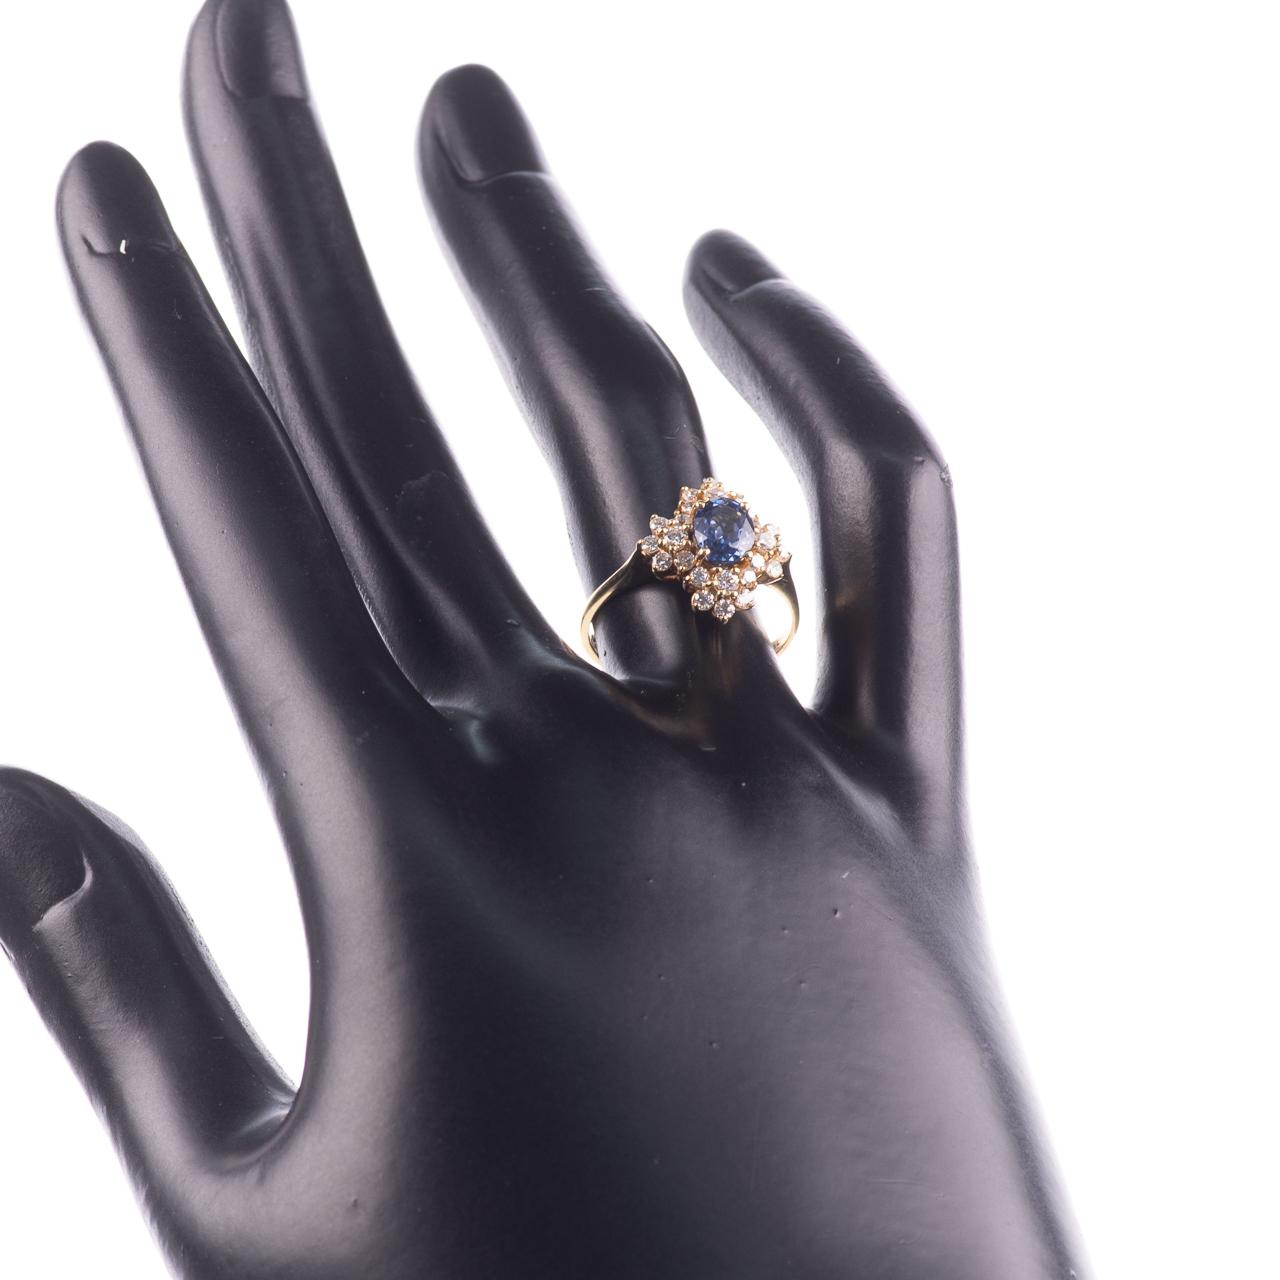 18ct Gold 1ct Sapphire & 0.70ct Diamond Ring - Image 3 of 8